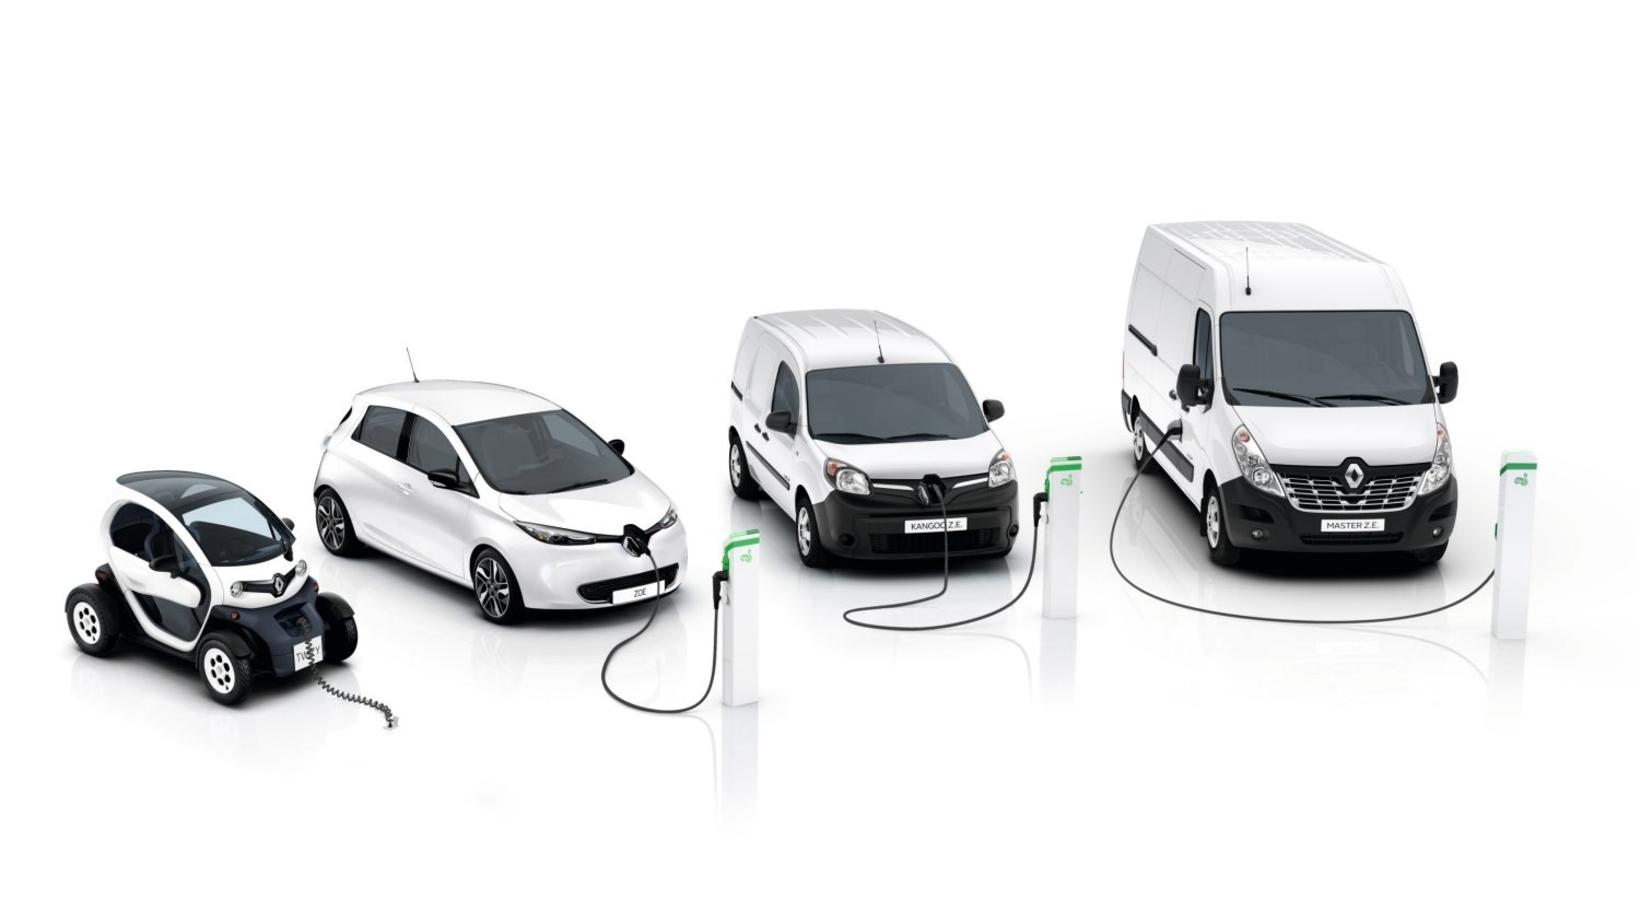 Frá vinstri: Renault Twizy, Zoe, Kangoo ZE og Master ZE.